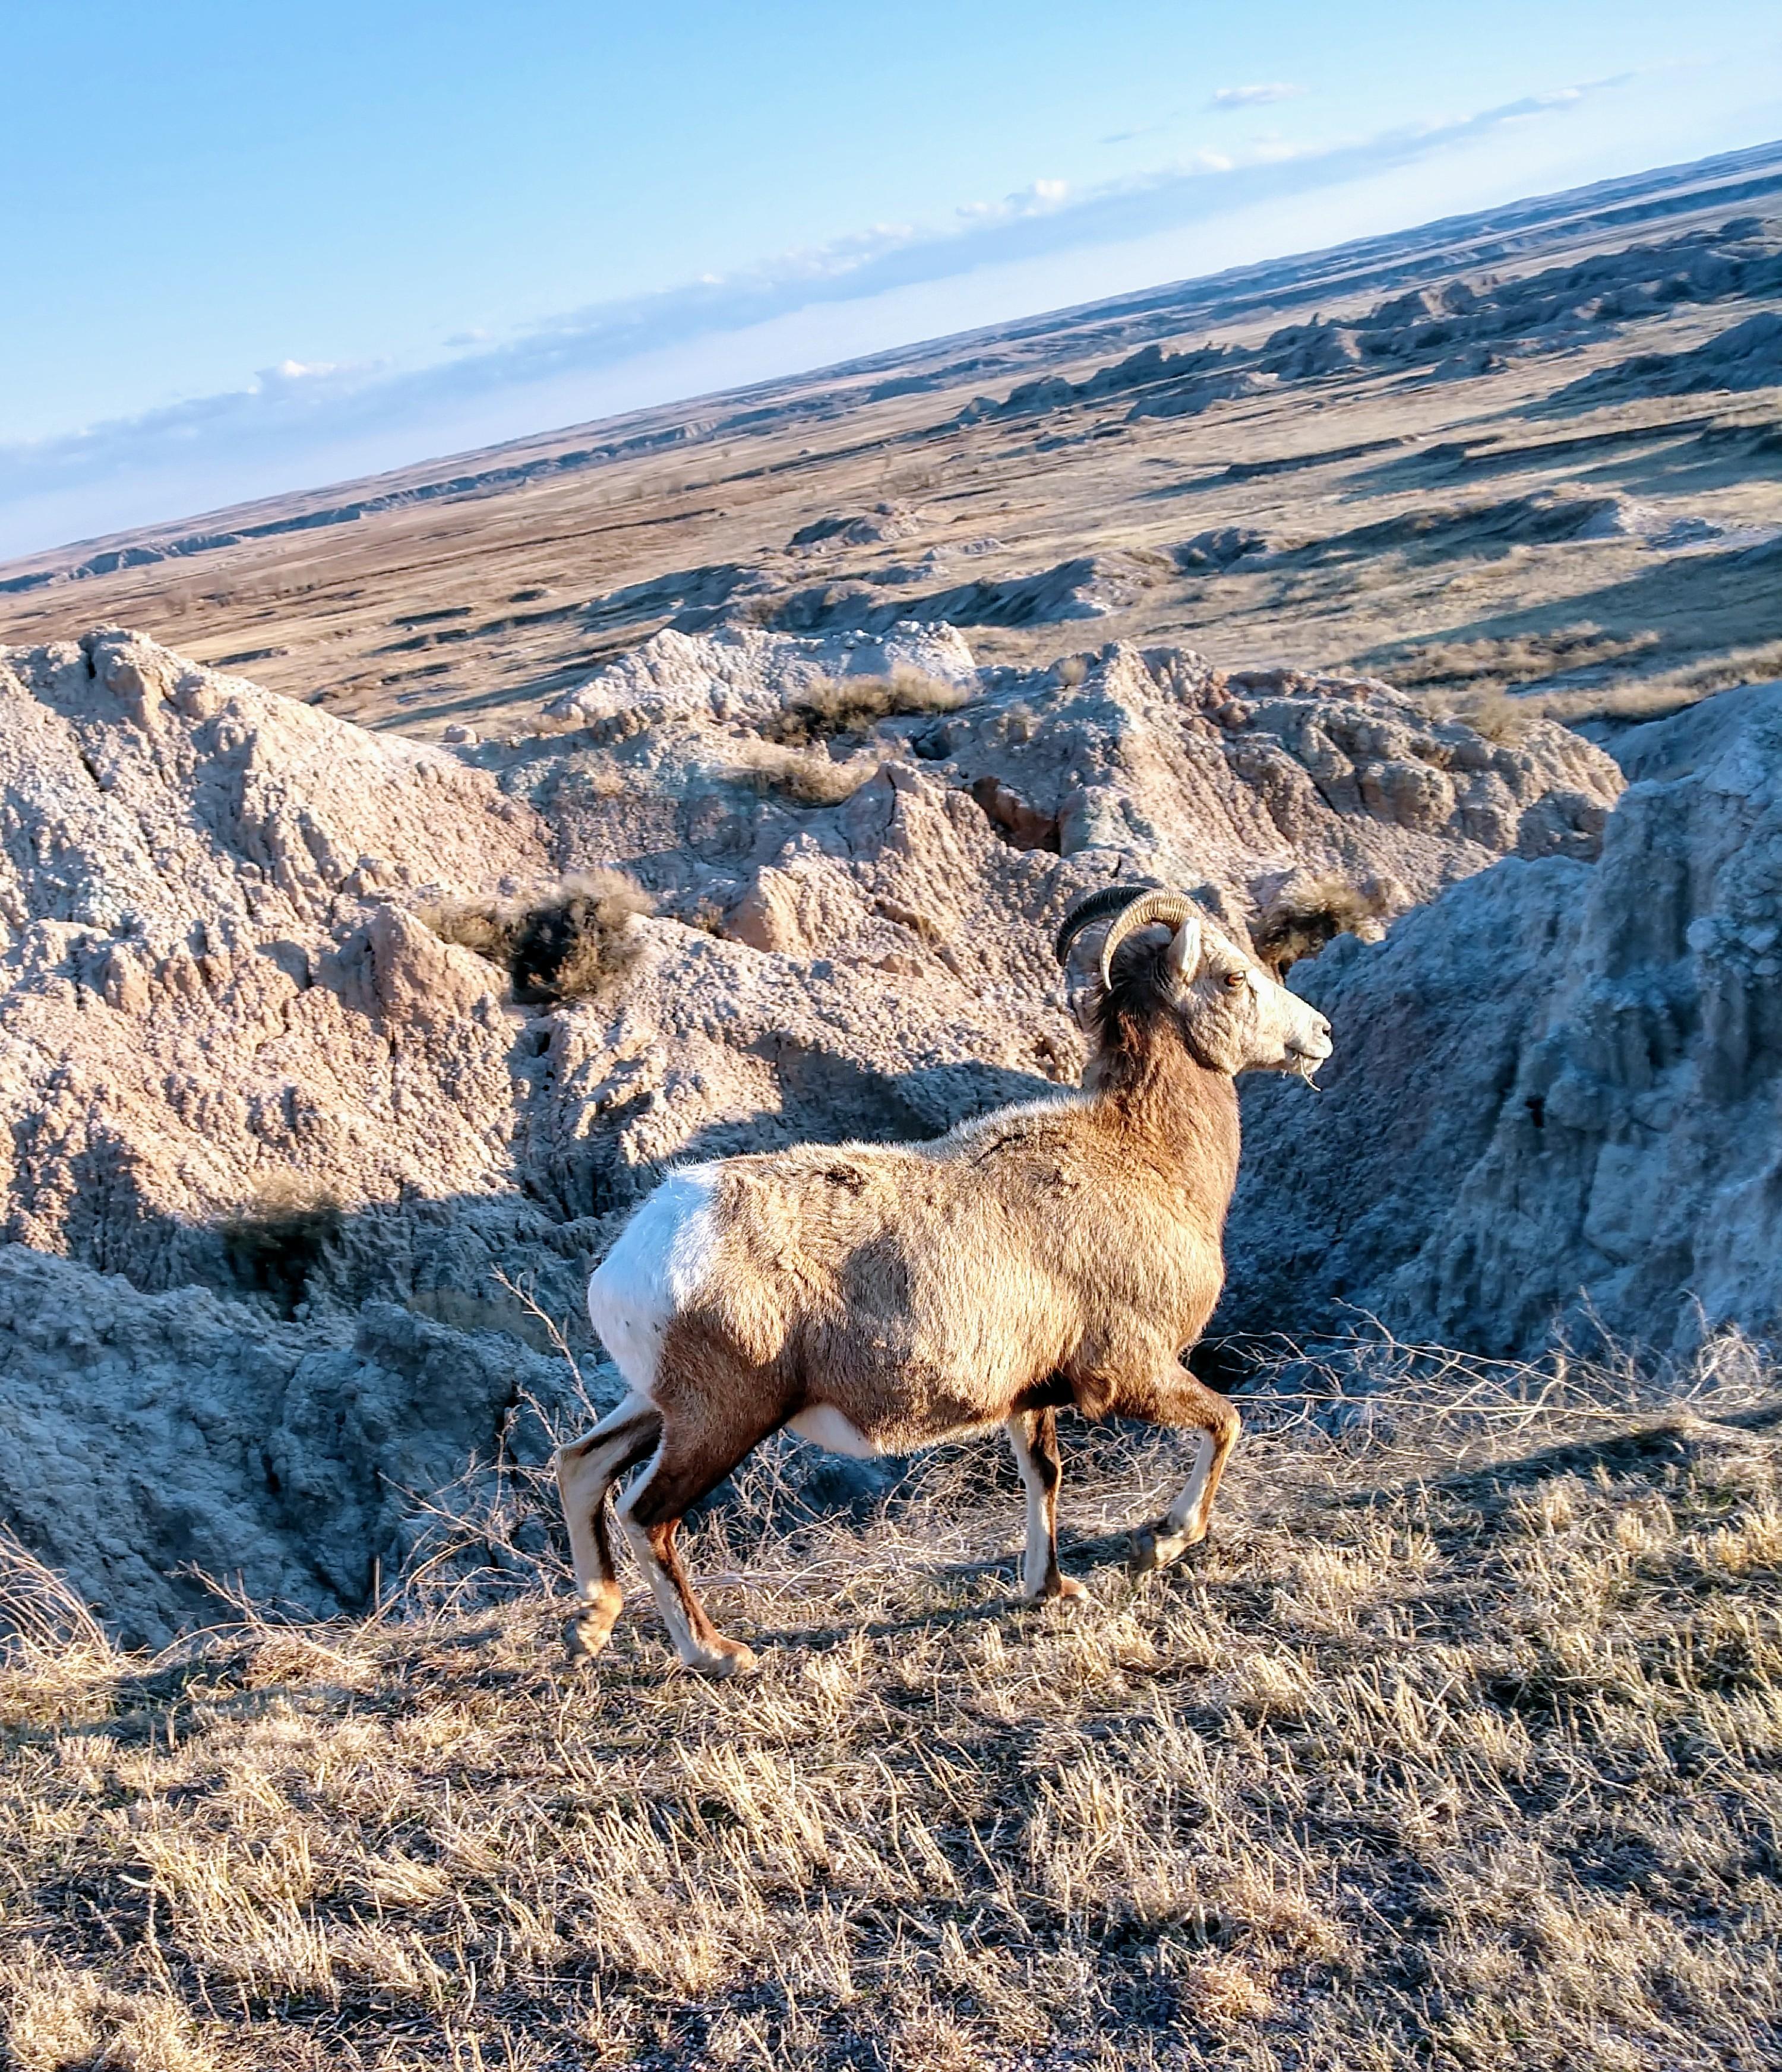 Badlands Wildlife